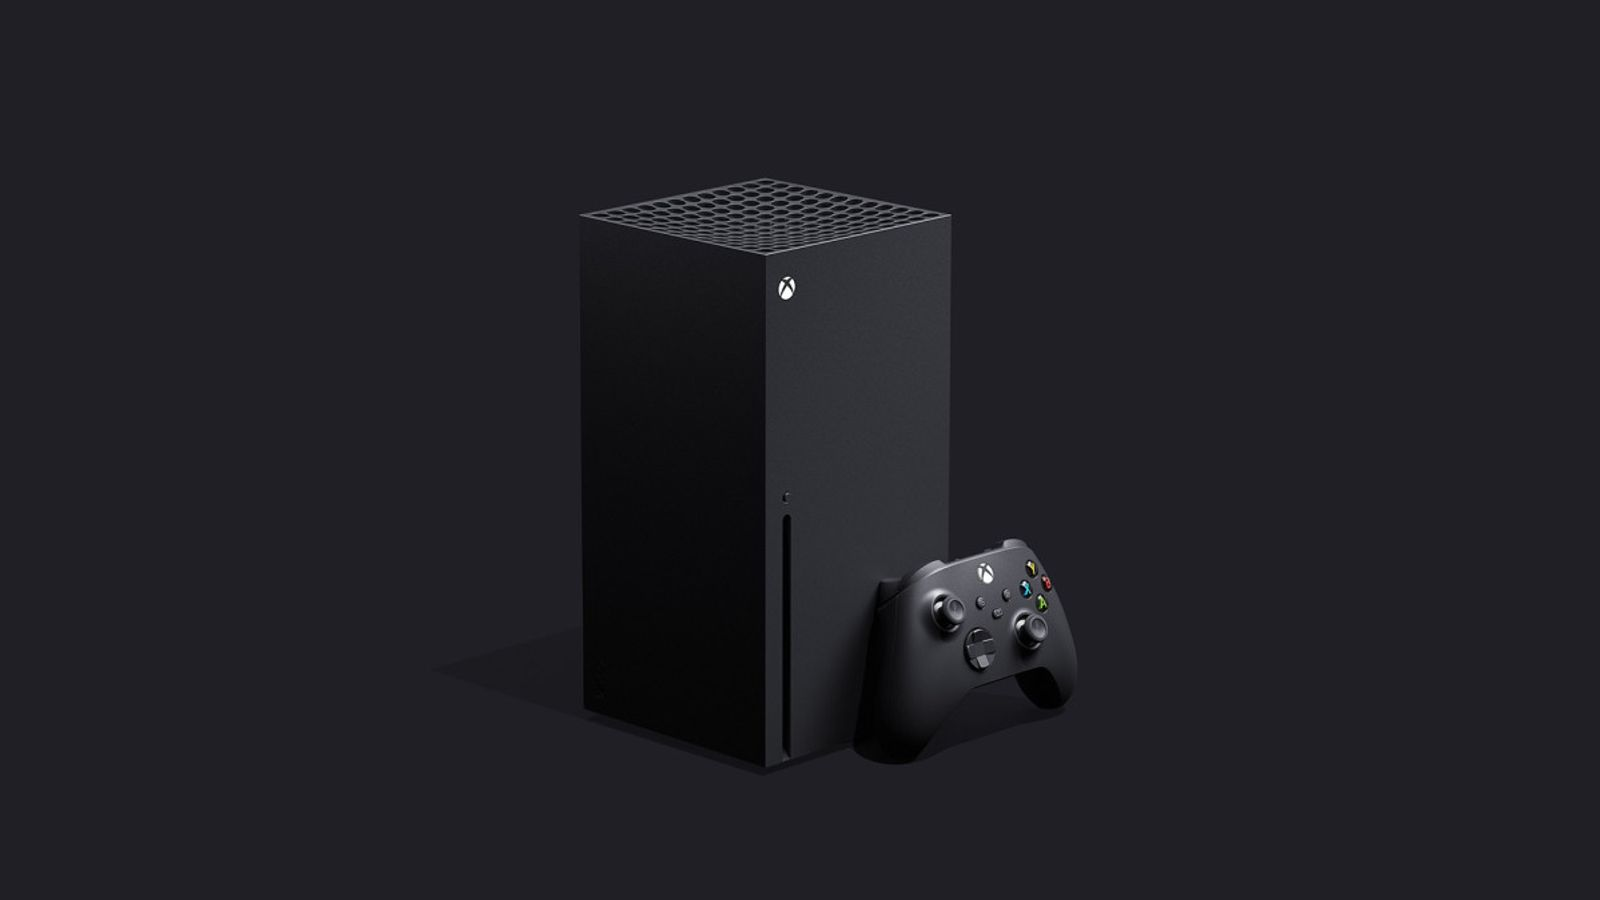 skynews xbox series x console 5065502 jpg?20200812115443.'